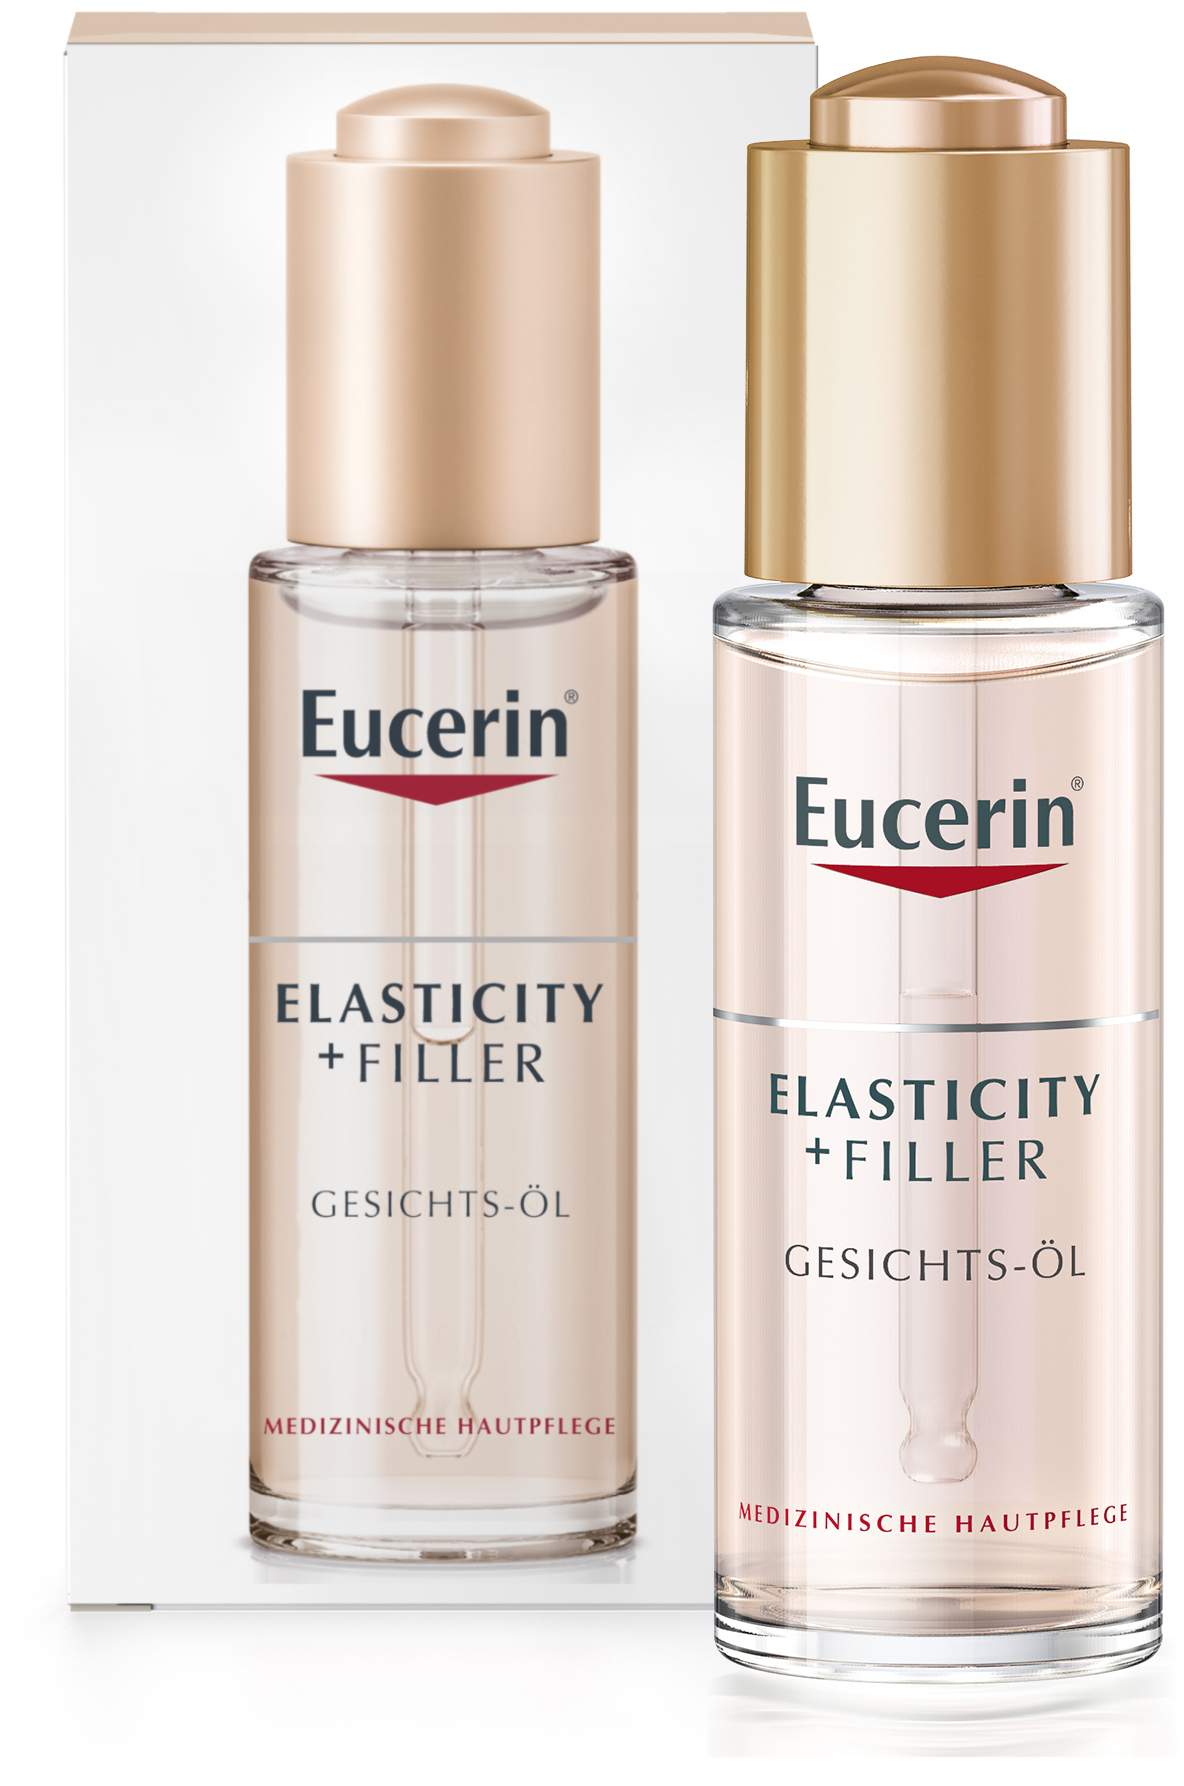 Eucerin Anti Age Elasticity + Filler Gesichtsöl 30 ml..